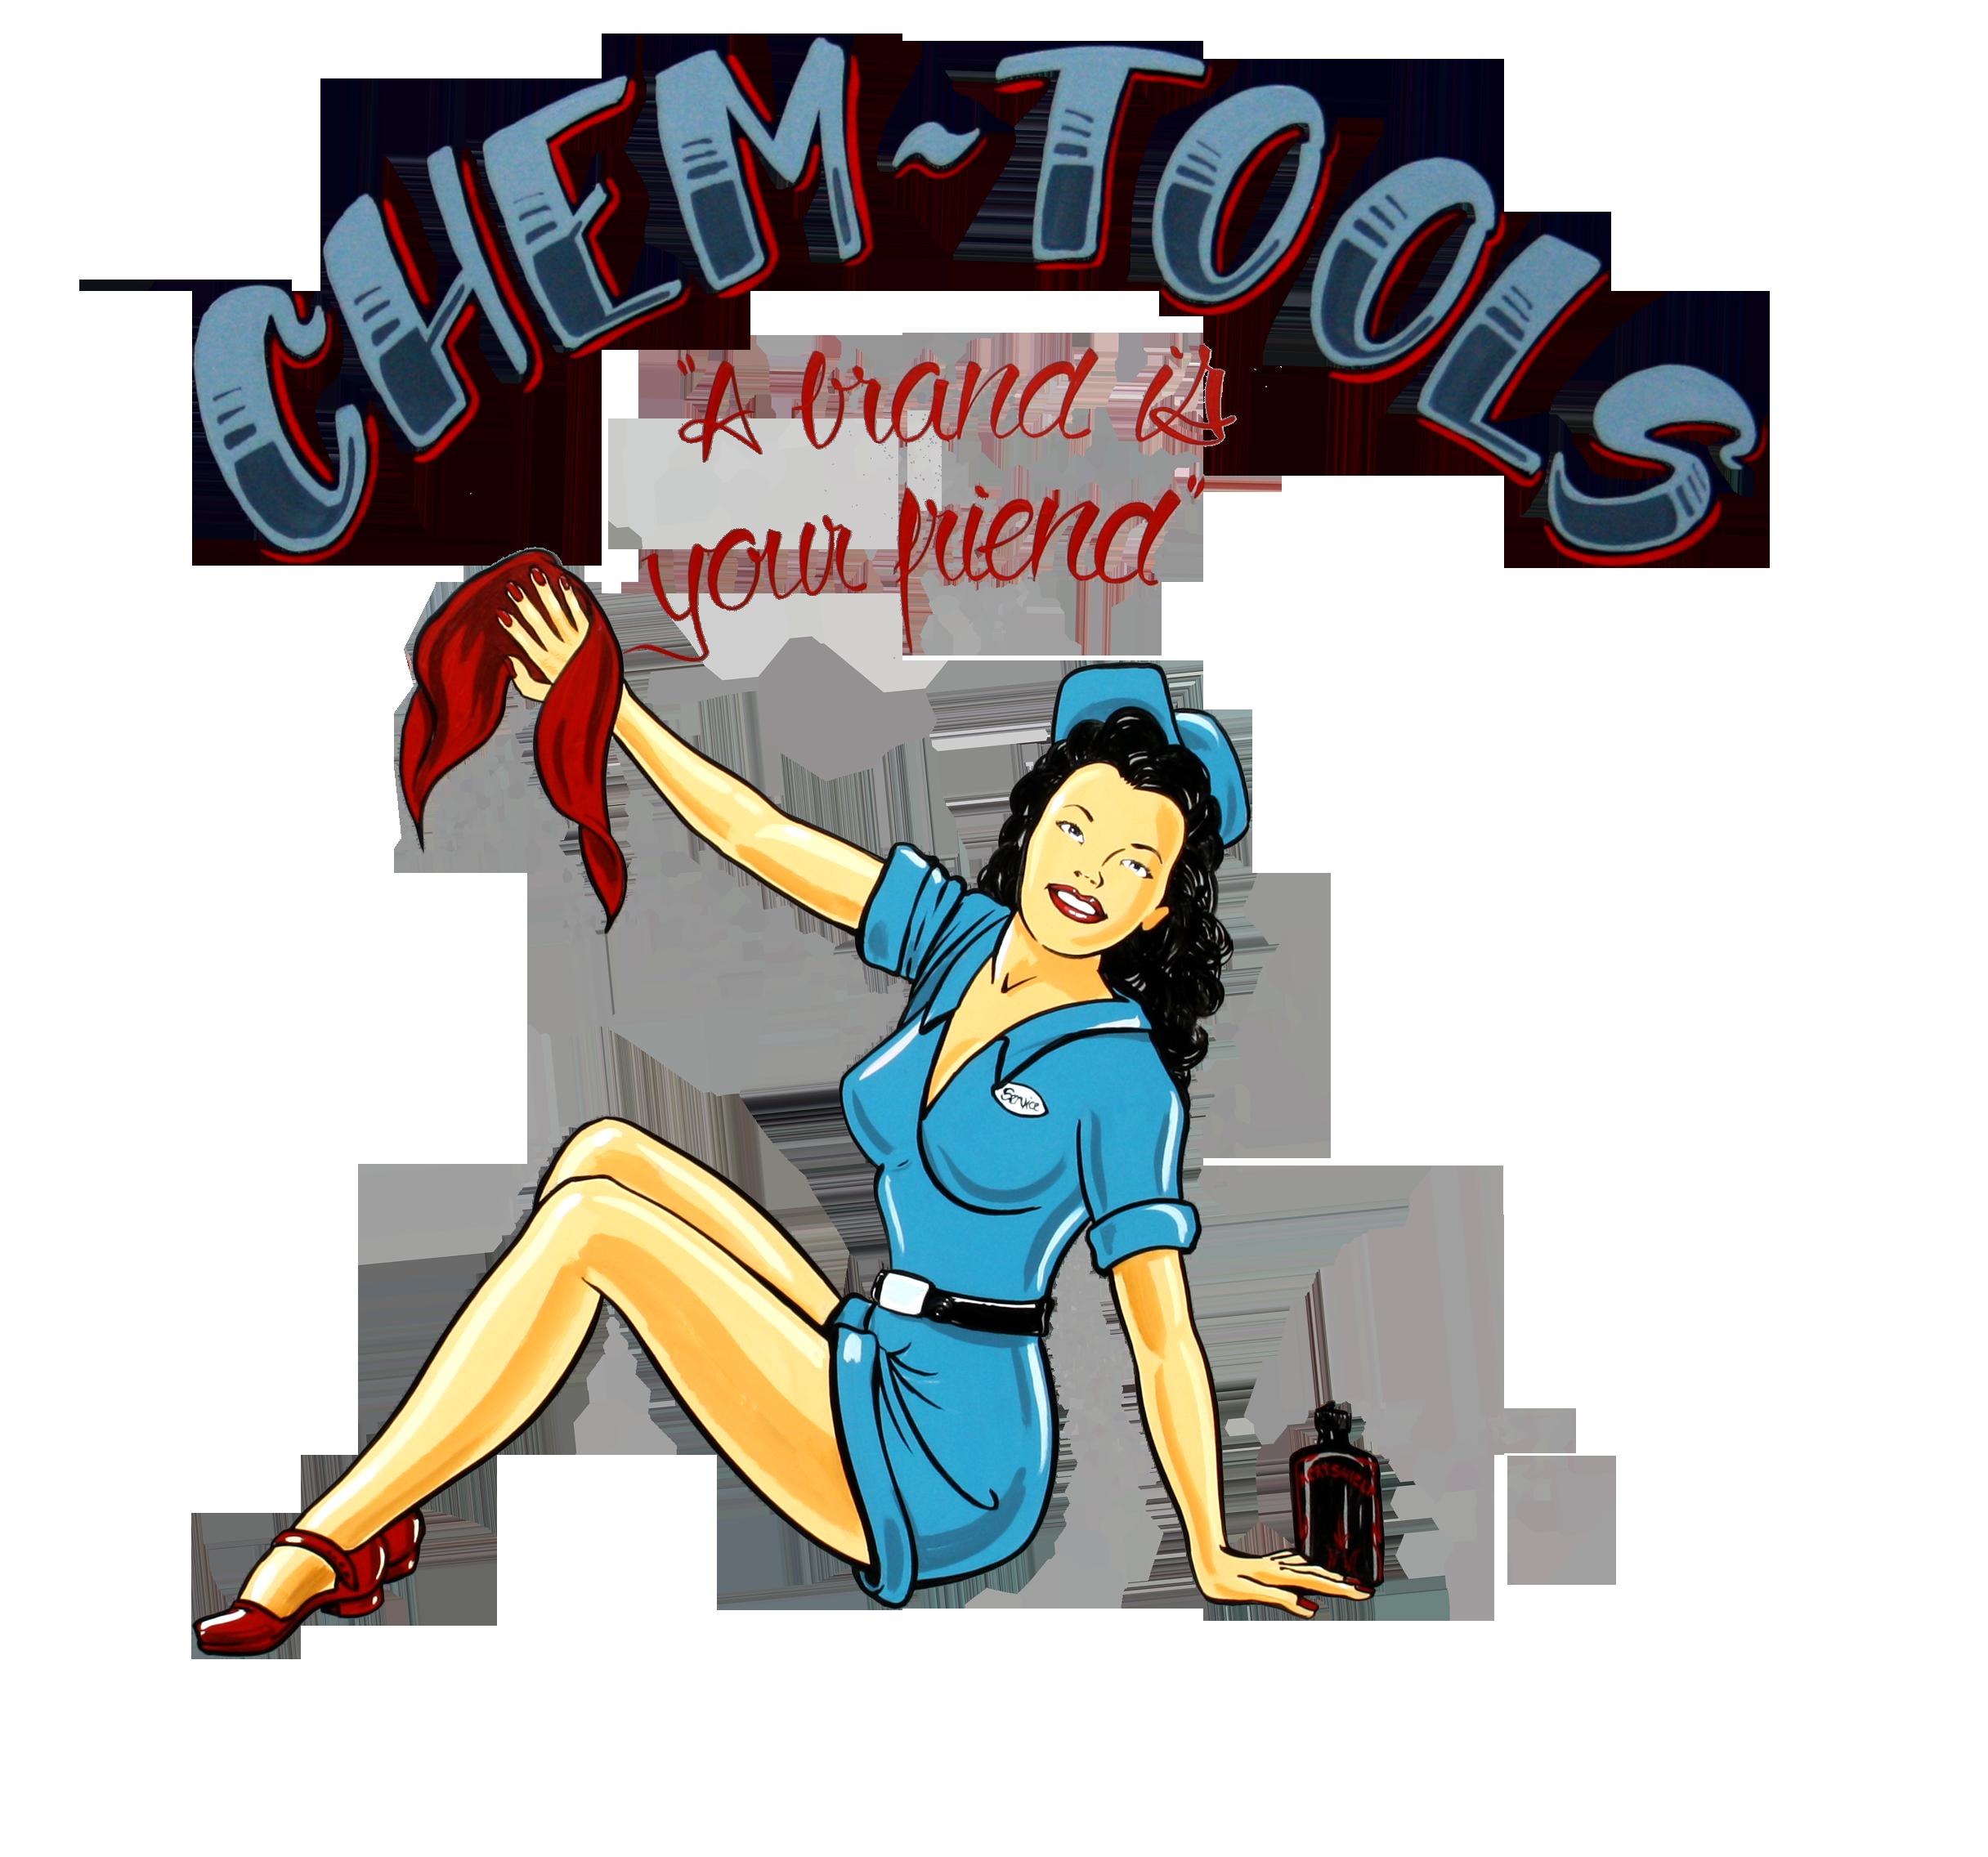 Chem-Tools